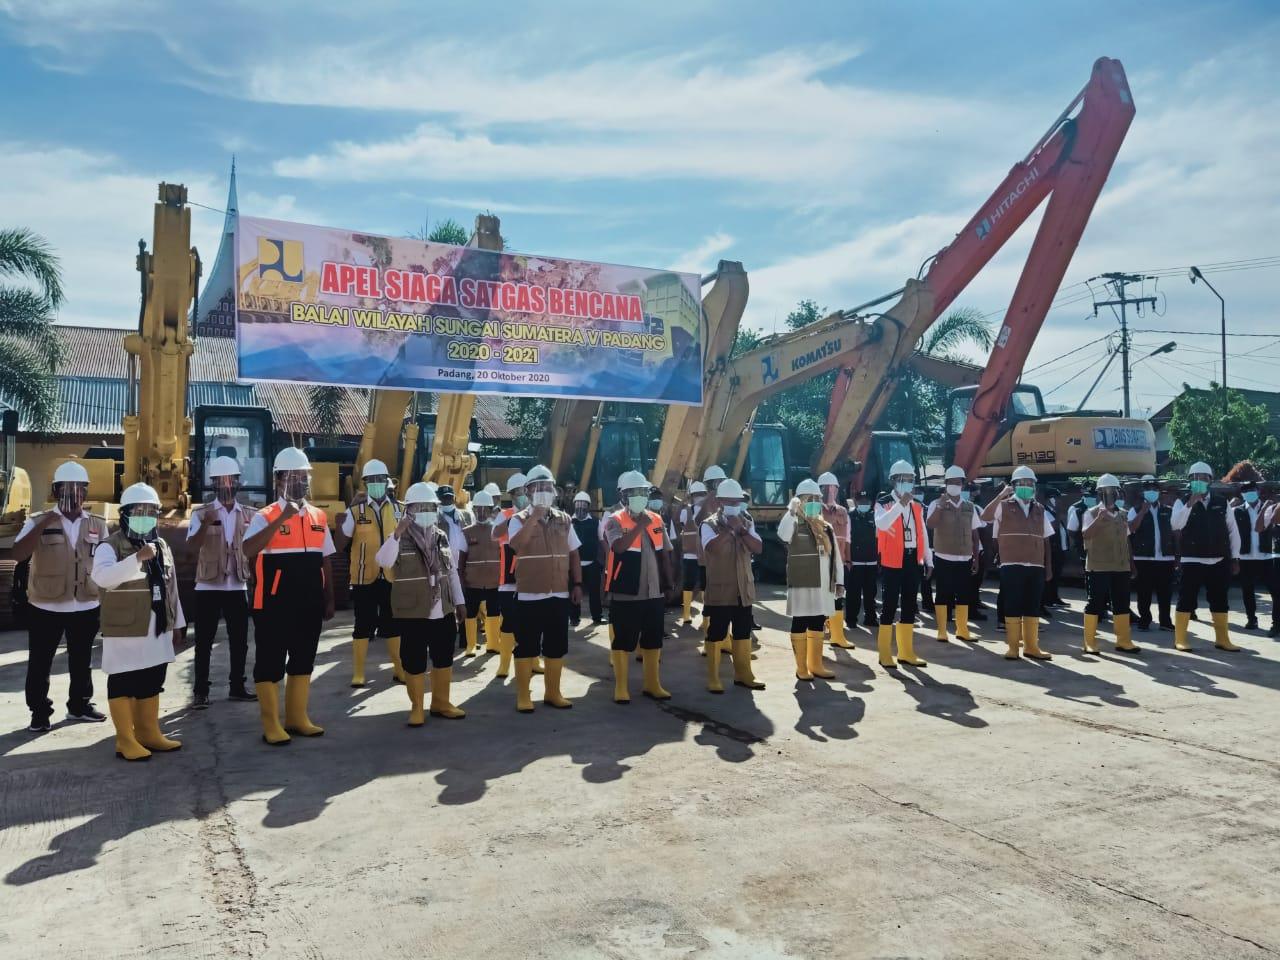 Apel Siaga Satgas Bencana BWS Sumatera V Padang; Siap Siaga Bencana!!